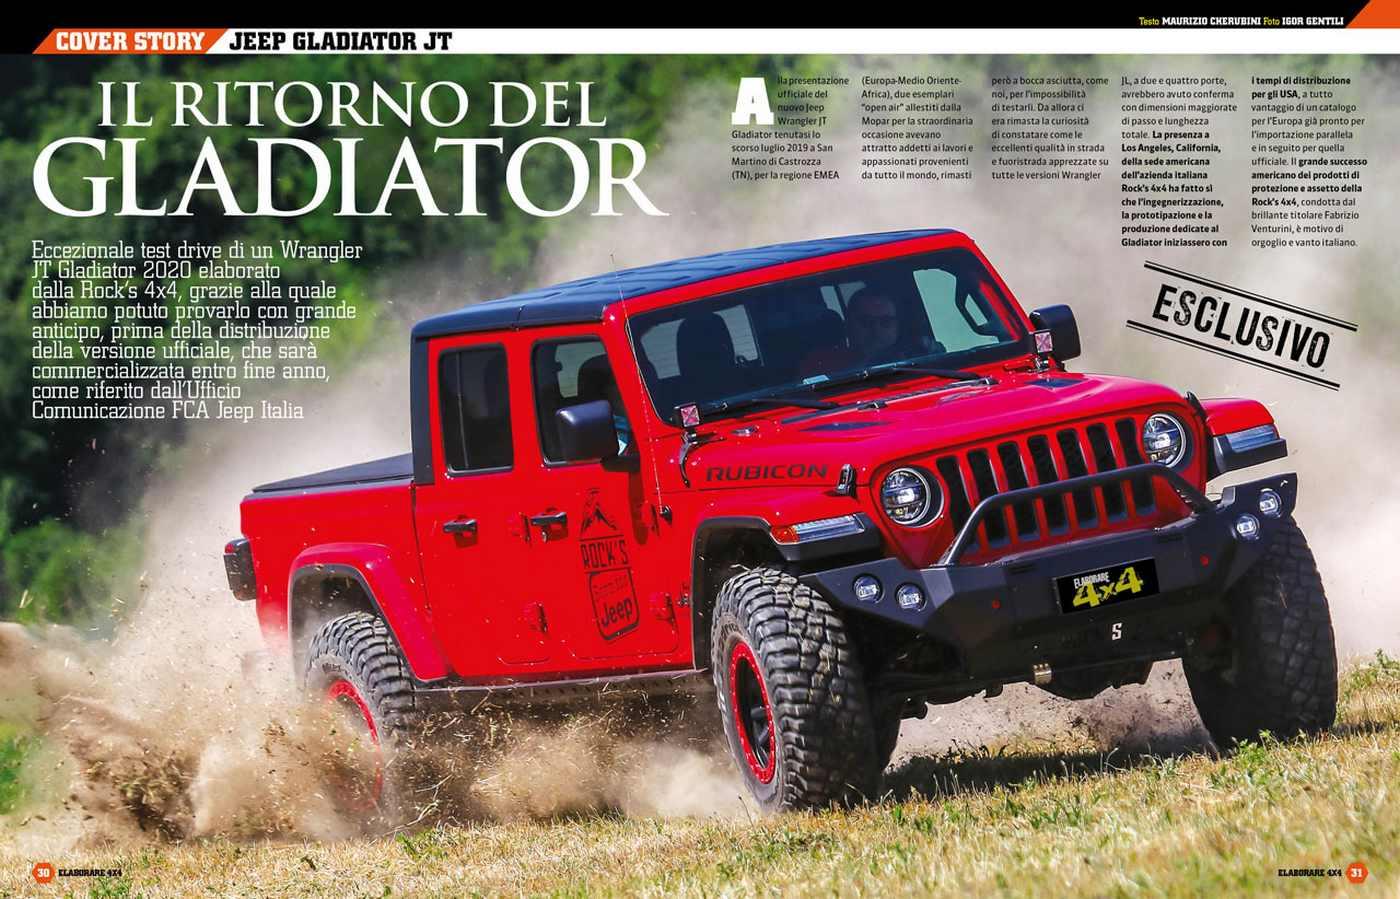 Jeep Gladiator JT prova come va